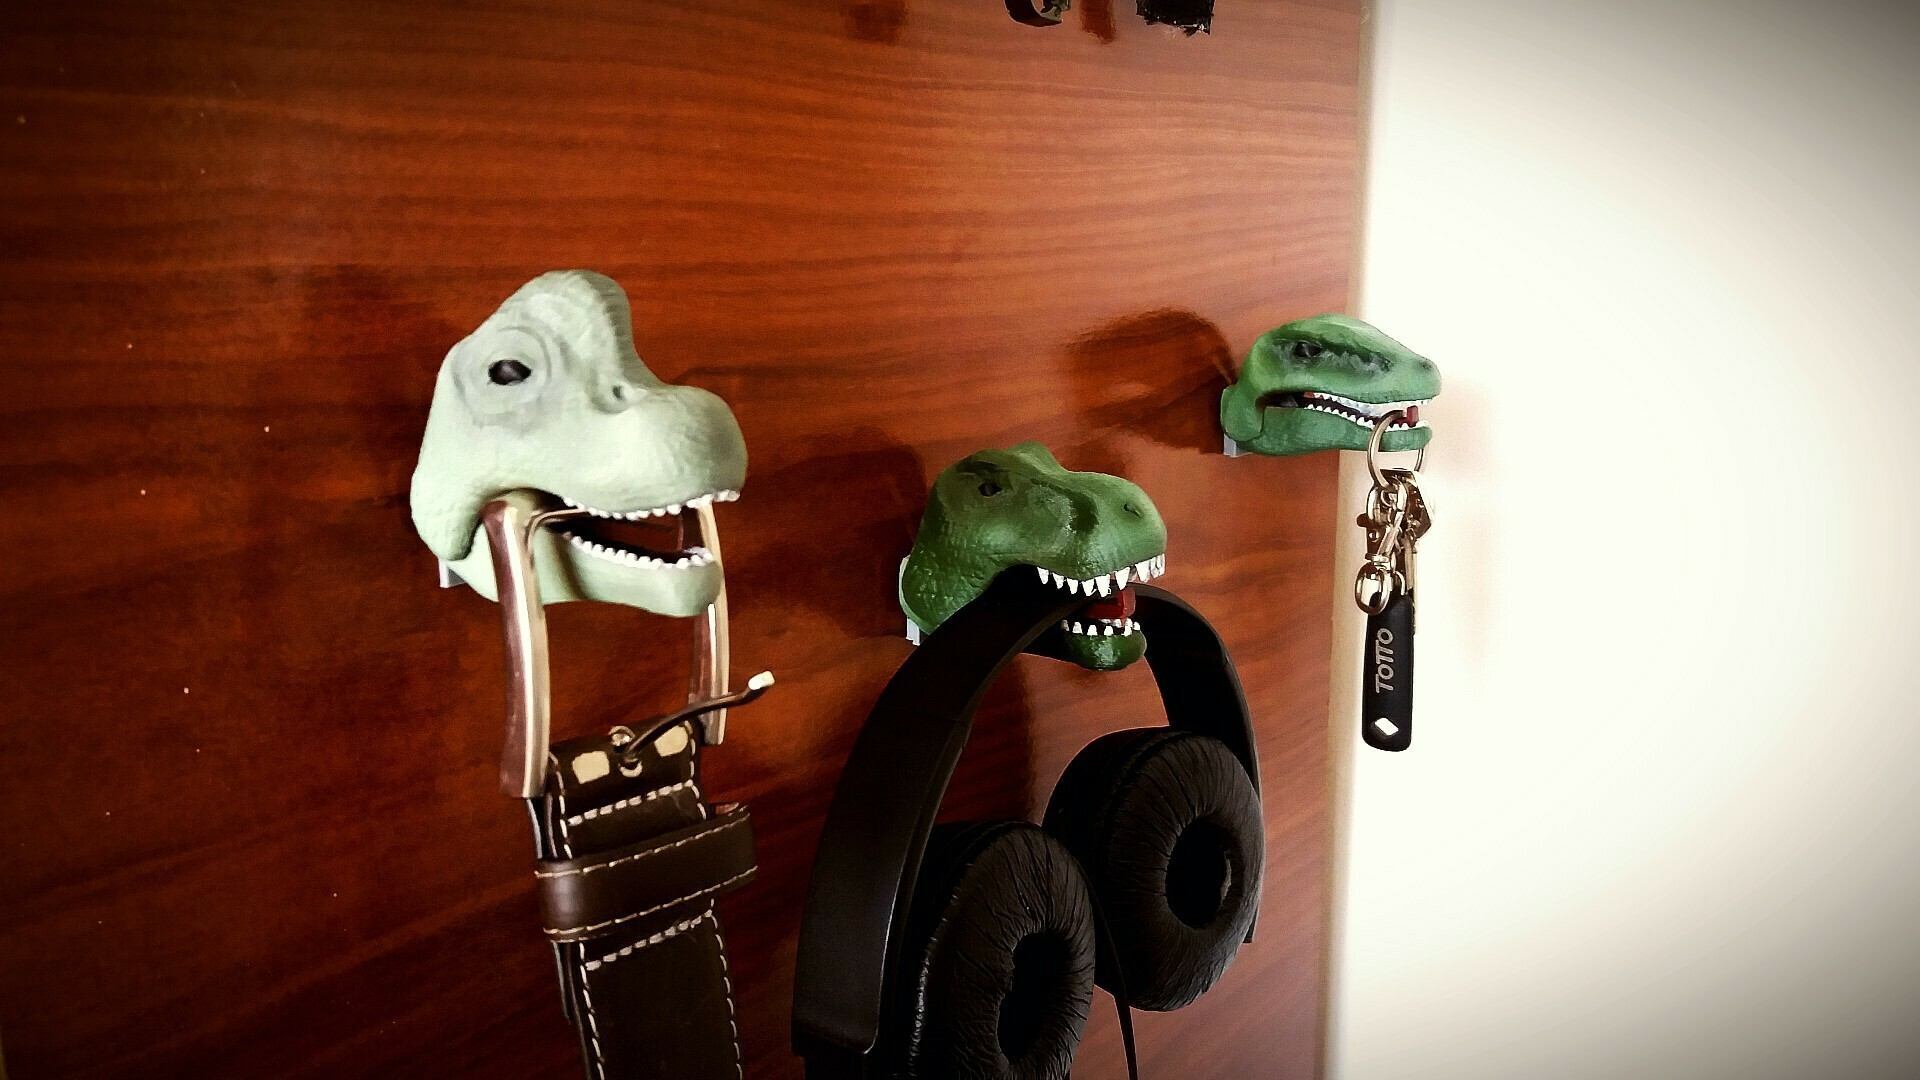 1 foto dinos.jpg Télécharger fichier STL Pendre les dinosaures • Objet à imprimer en 3D, Aslan3d